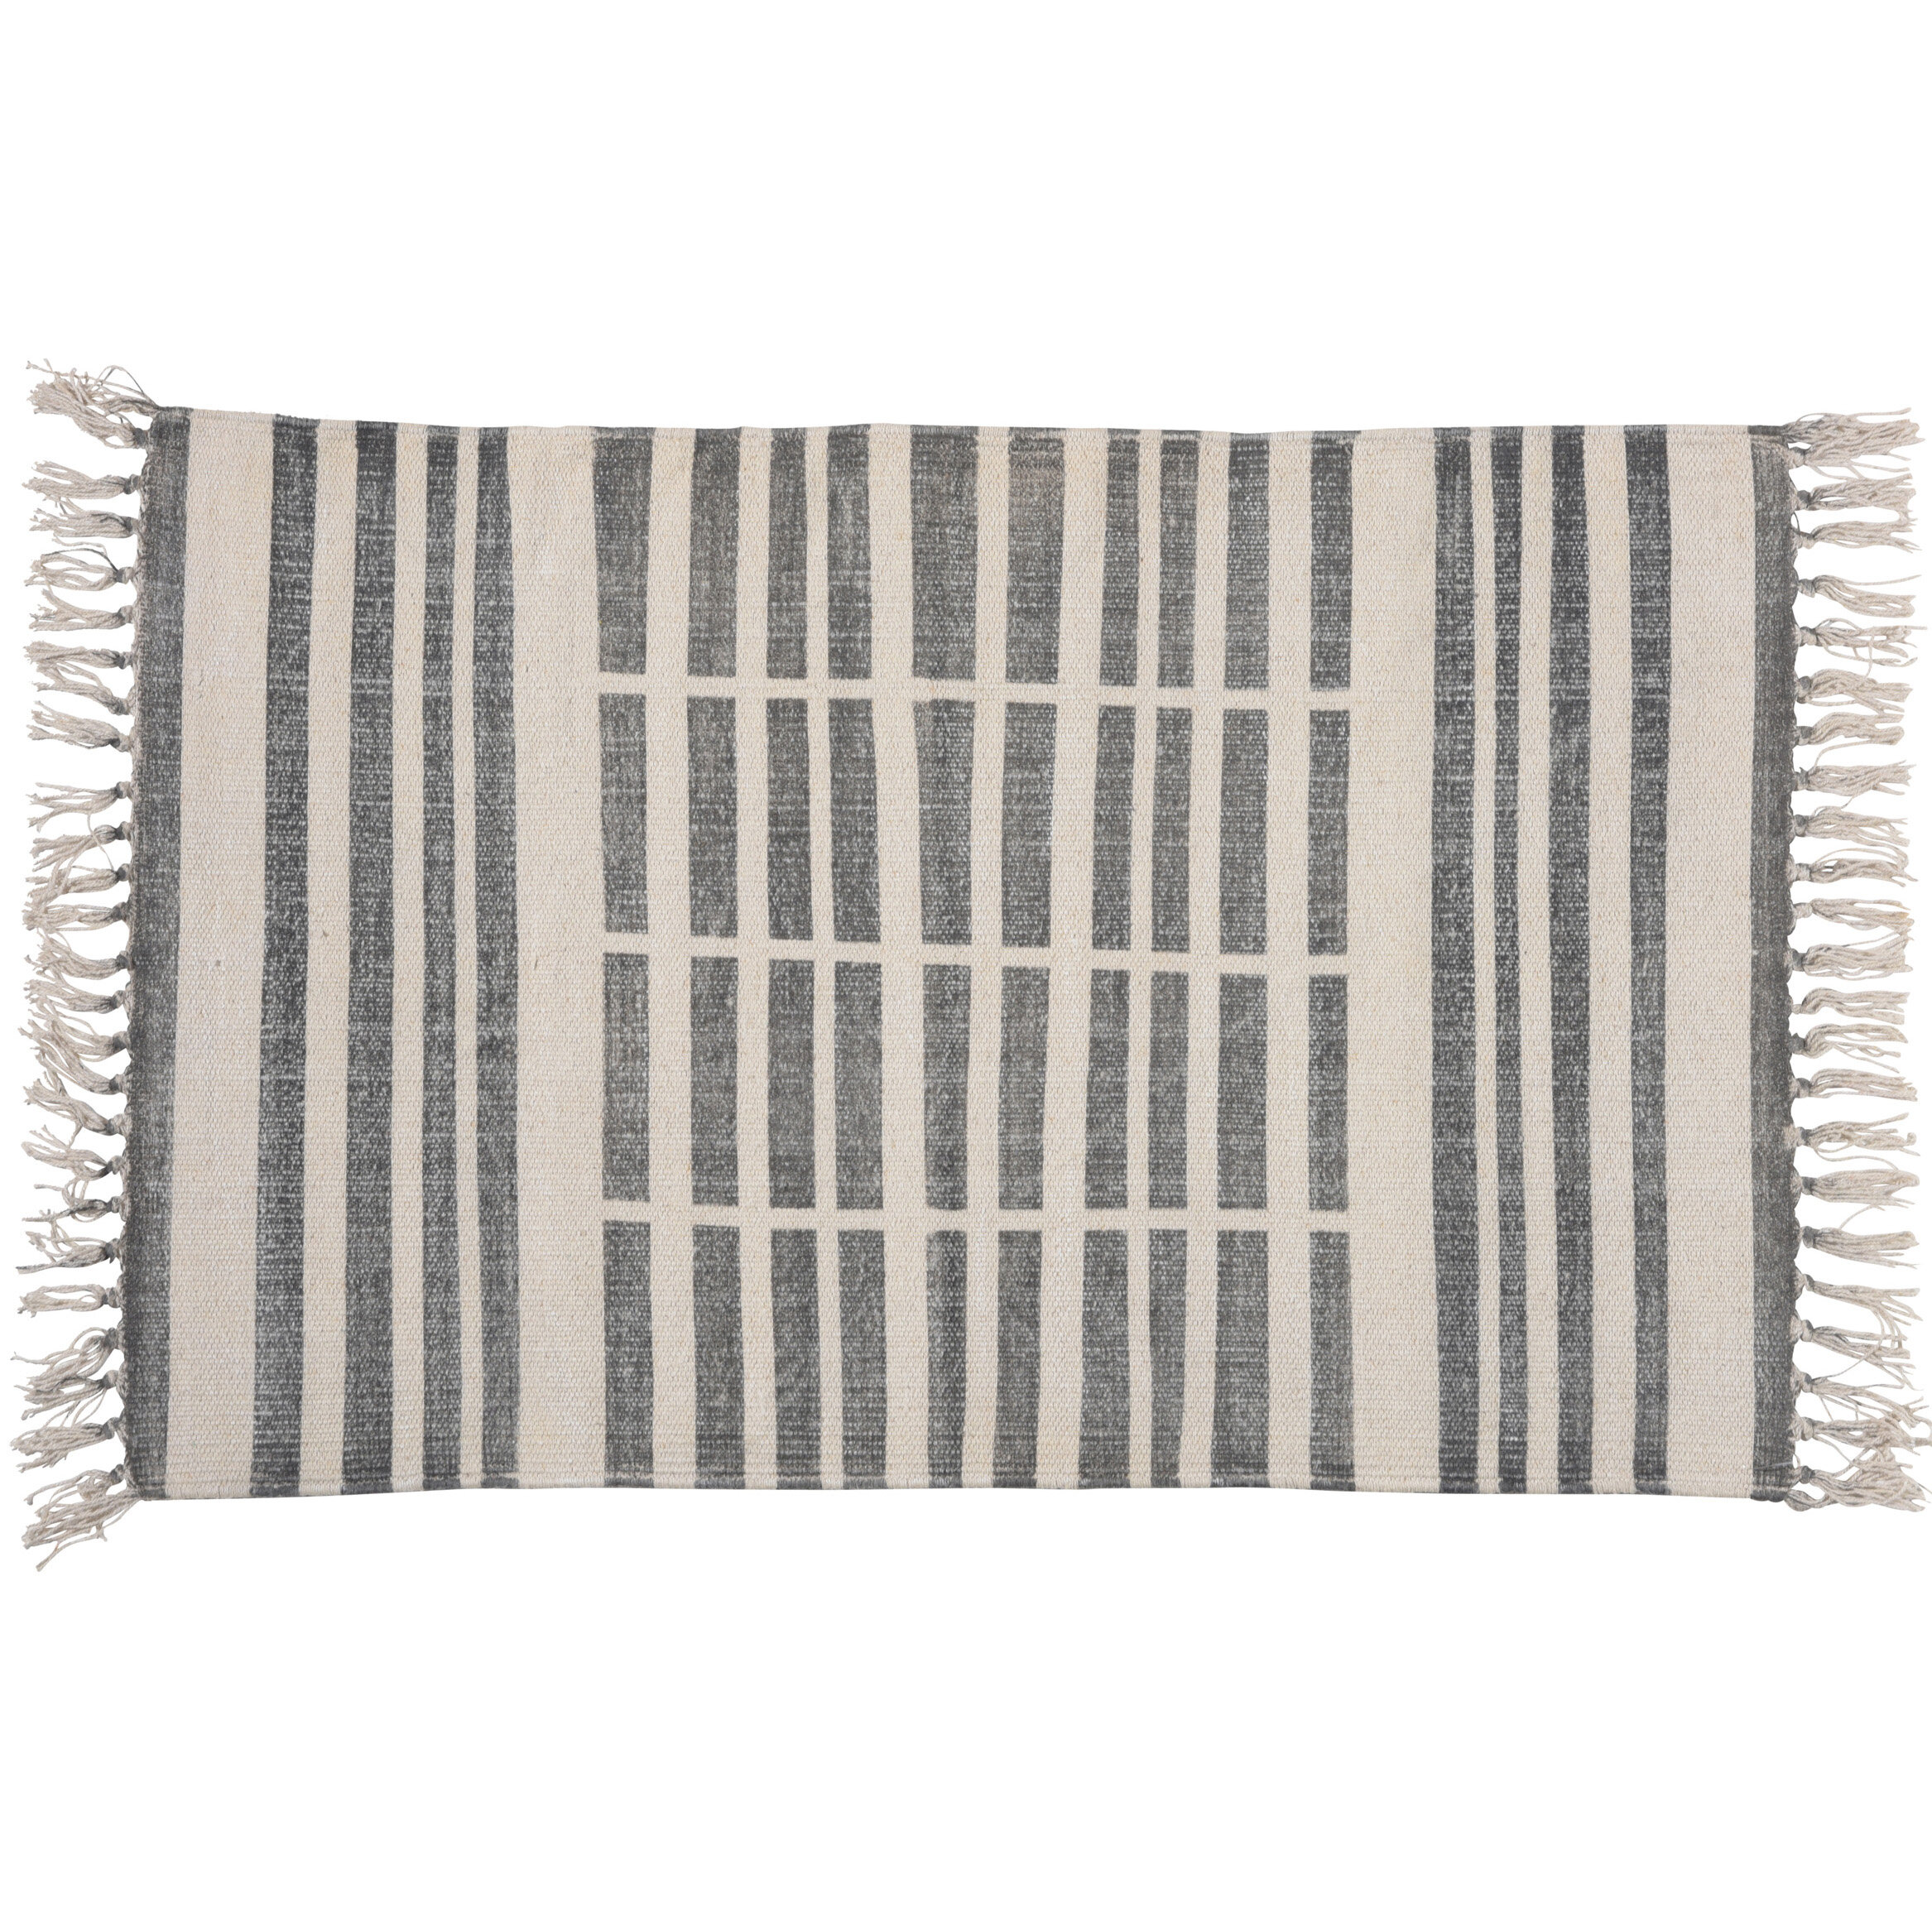 Union Rustic Orchard Street Handwoven Flatweave Cotton Gray